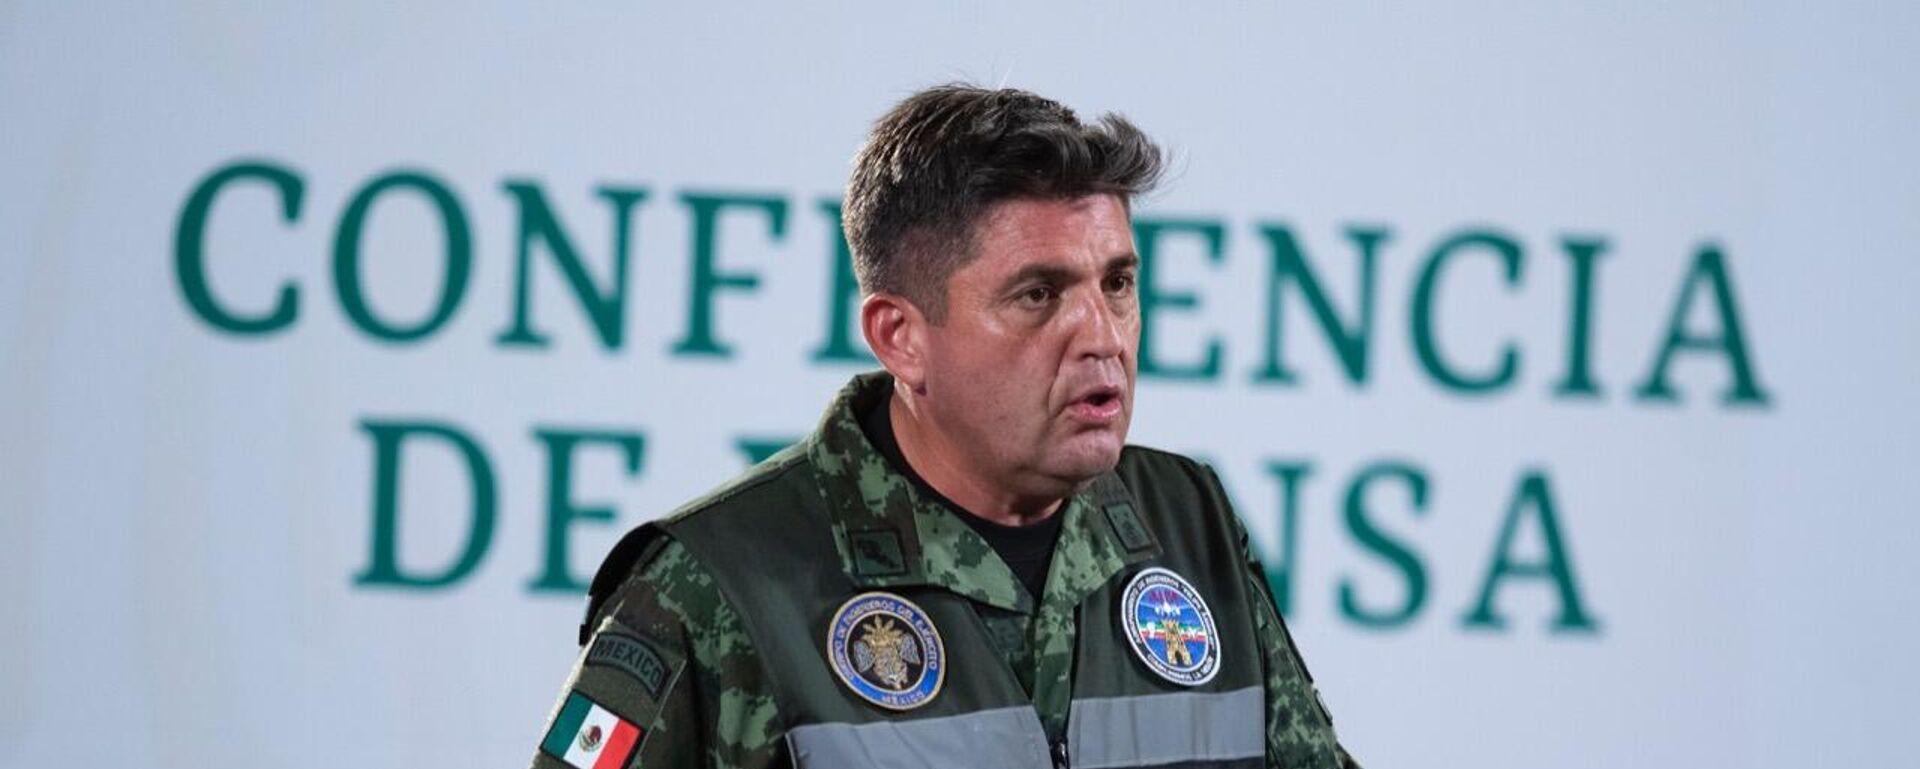 Gustavo Ricardo Vallejo, ingeniero residente general y comandante del Agrupamiento de Ingenieros Felipe Ángeles. - Sputnik Mundo, 1920, 10.09.2021